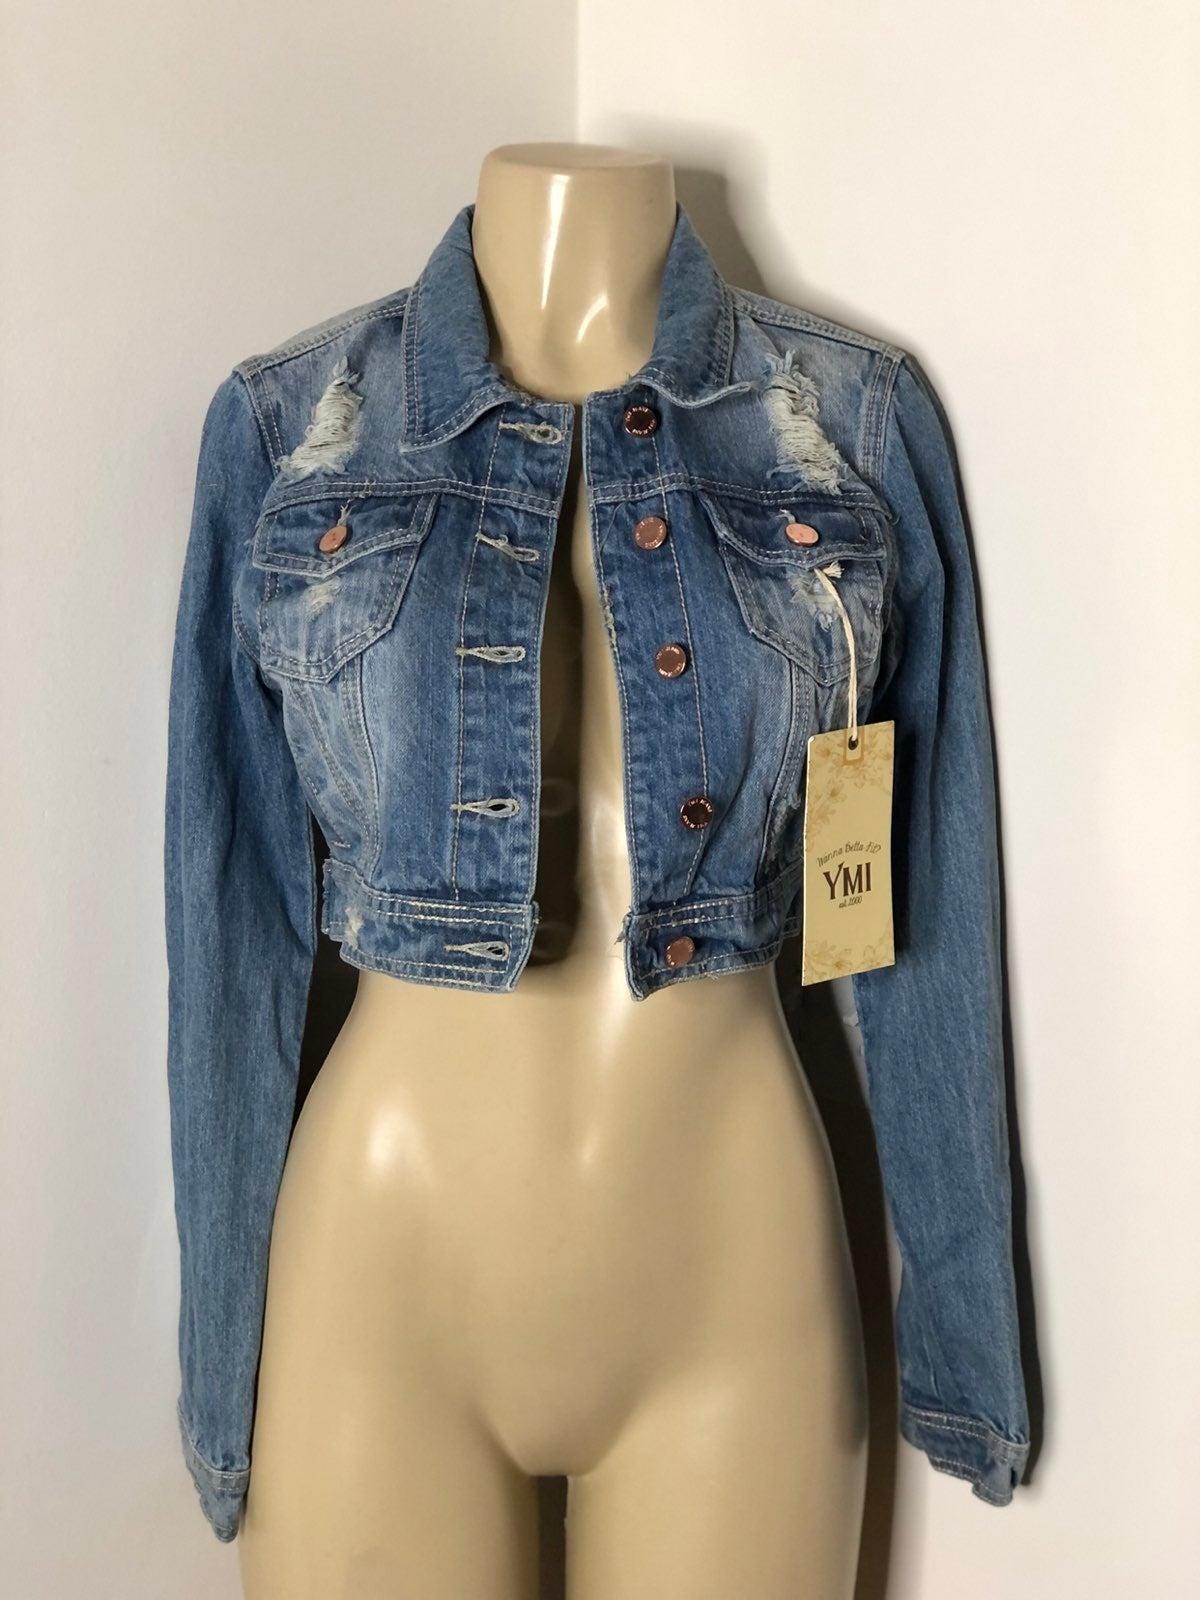 YMI jeans denim rip & tear jacket